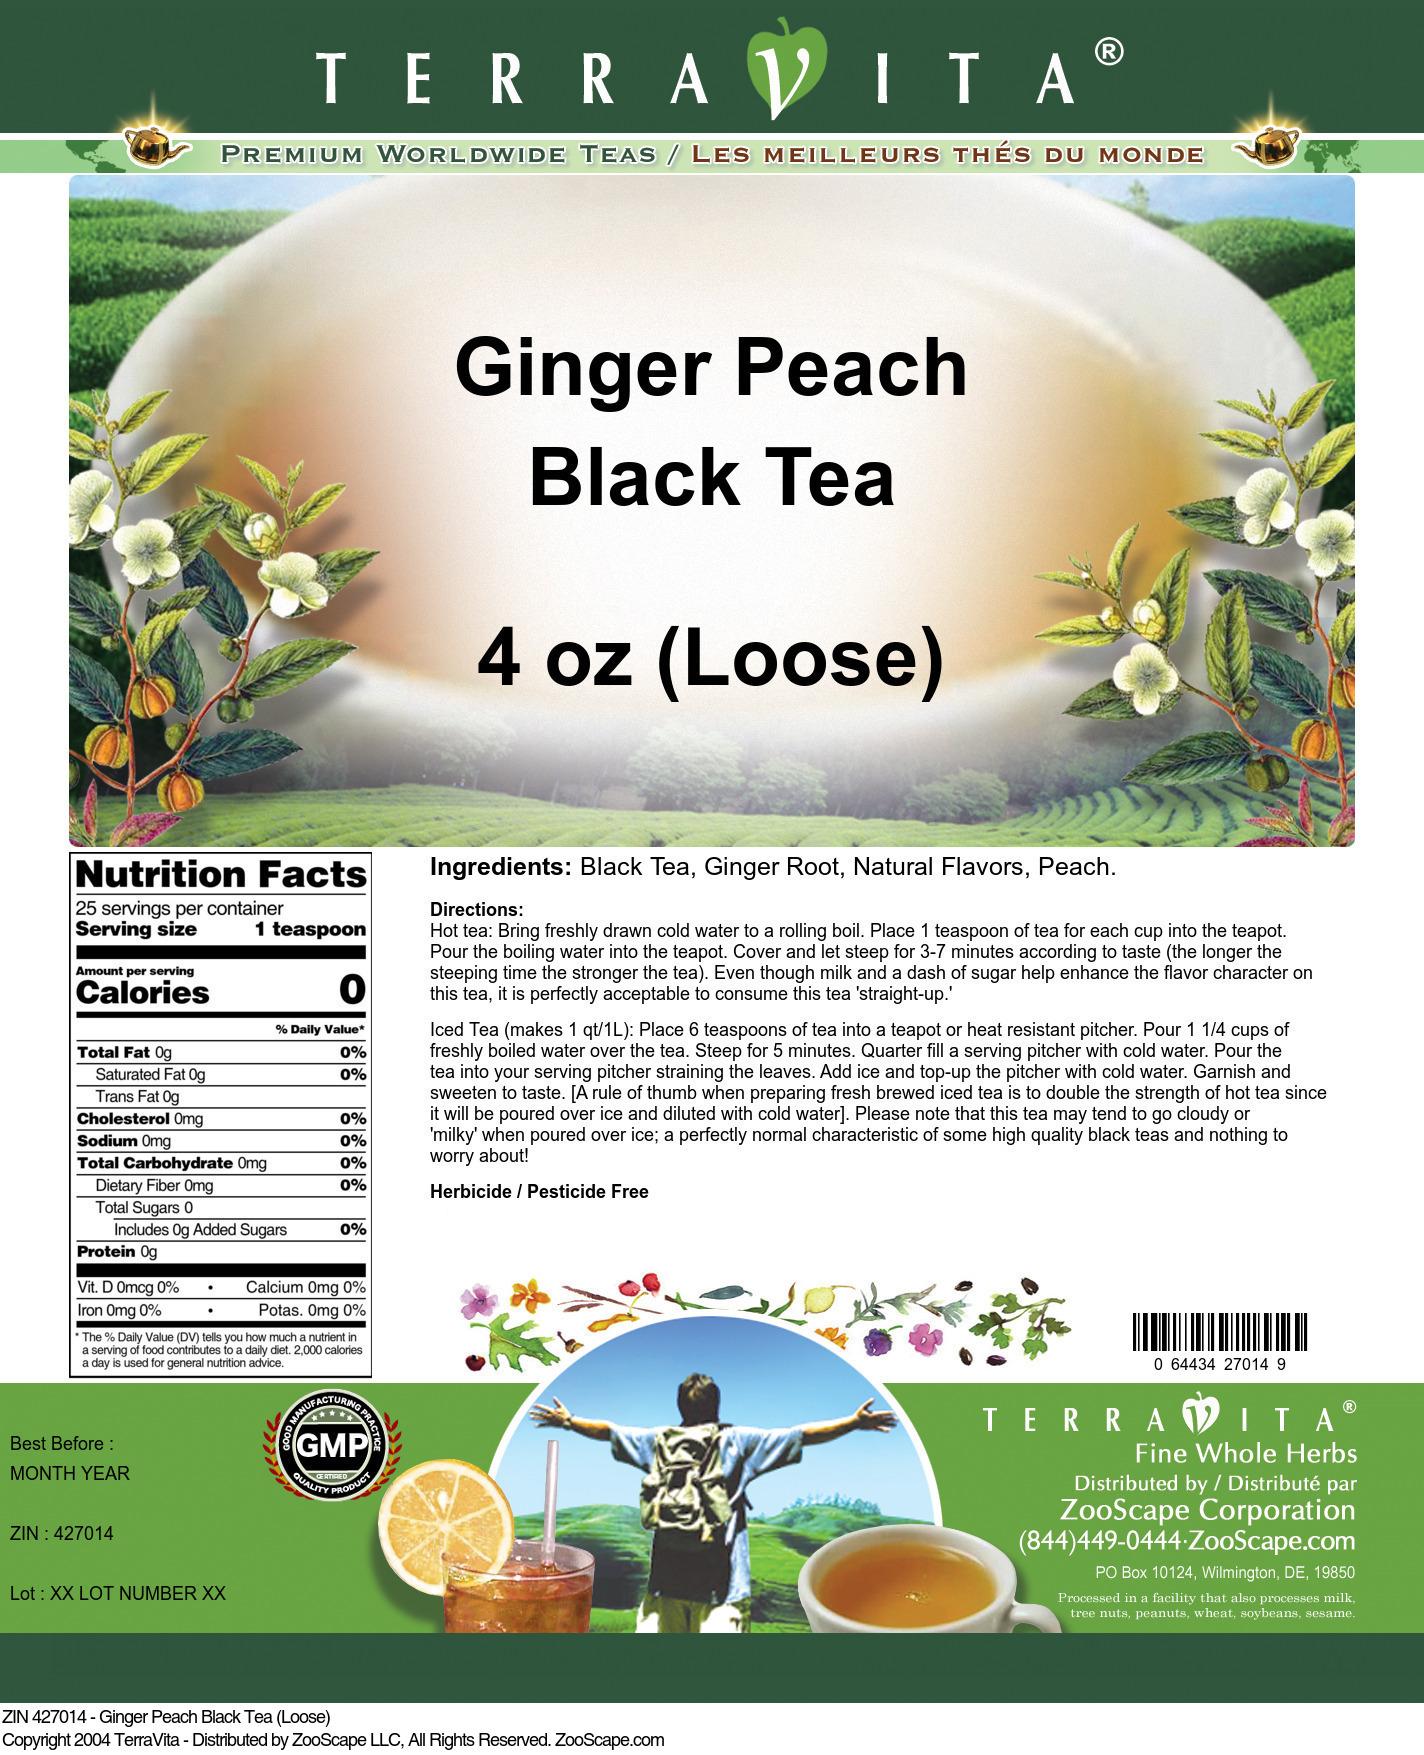 Ginger Peach Black Tea (Loose)